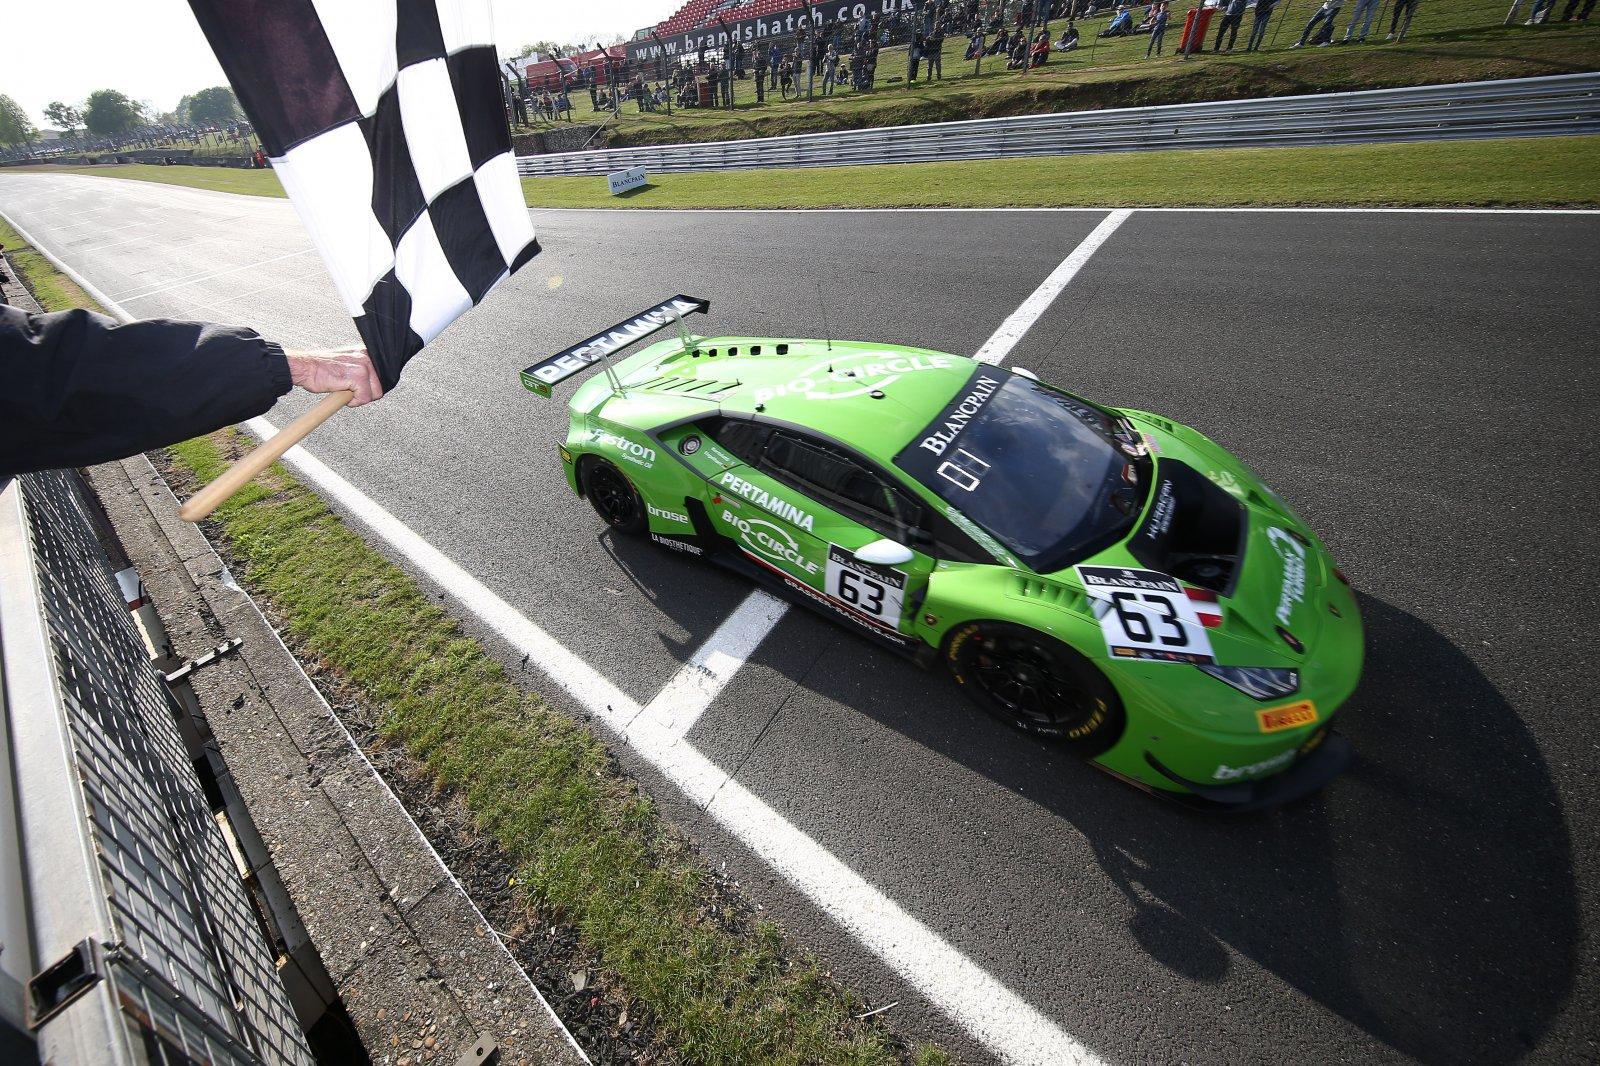 GRT Grasser Racing aims at 2018 Blancpain GT Series titles with three Lamborghini Huracán GT3s.